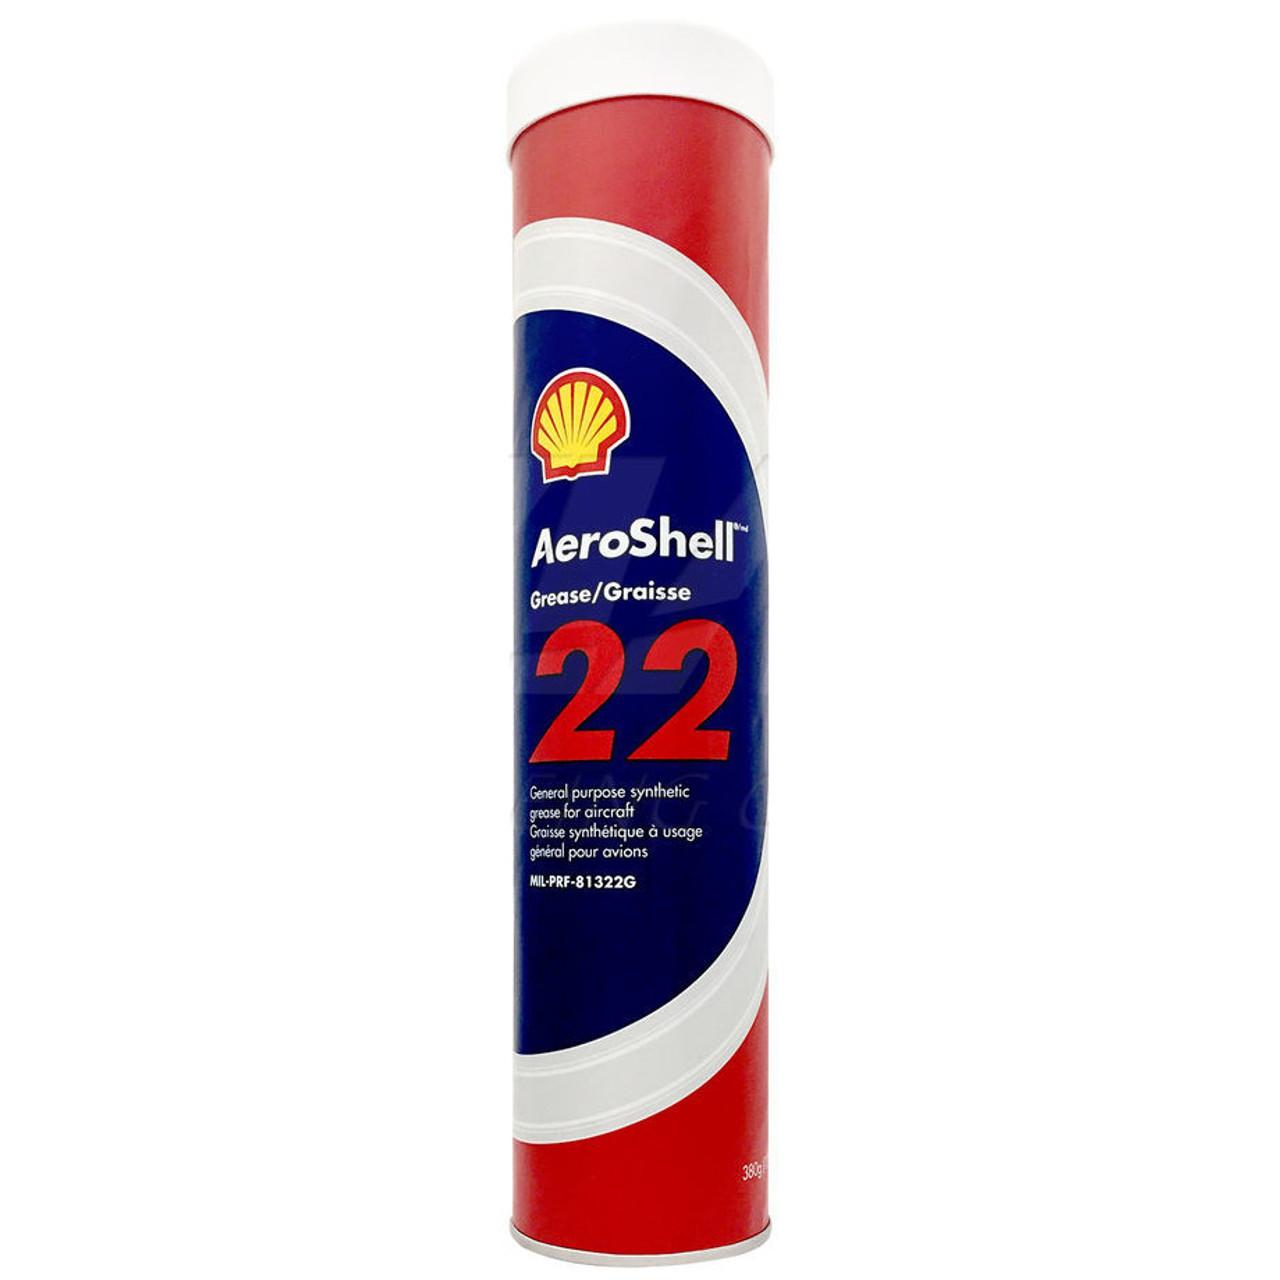 Aeroshell Grease 22 - Versatile Multipurpose Grease - 14oz